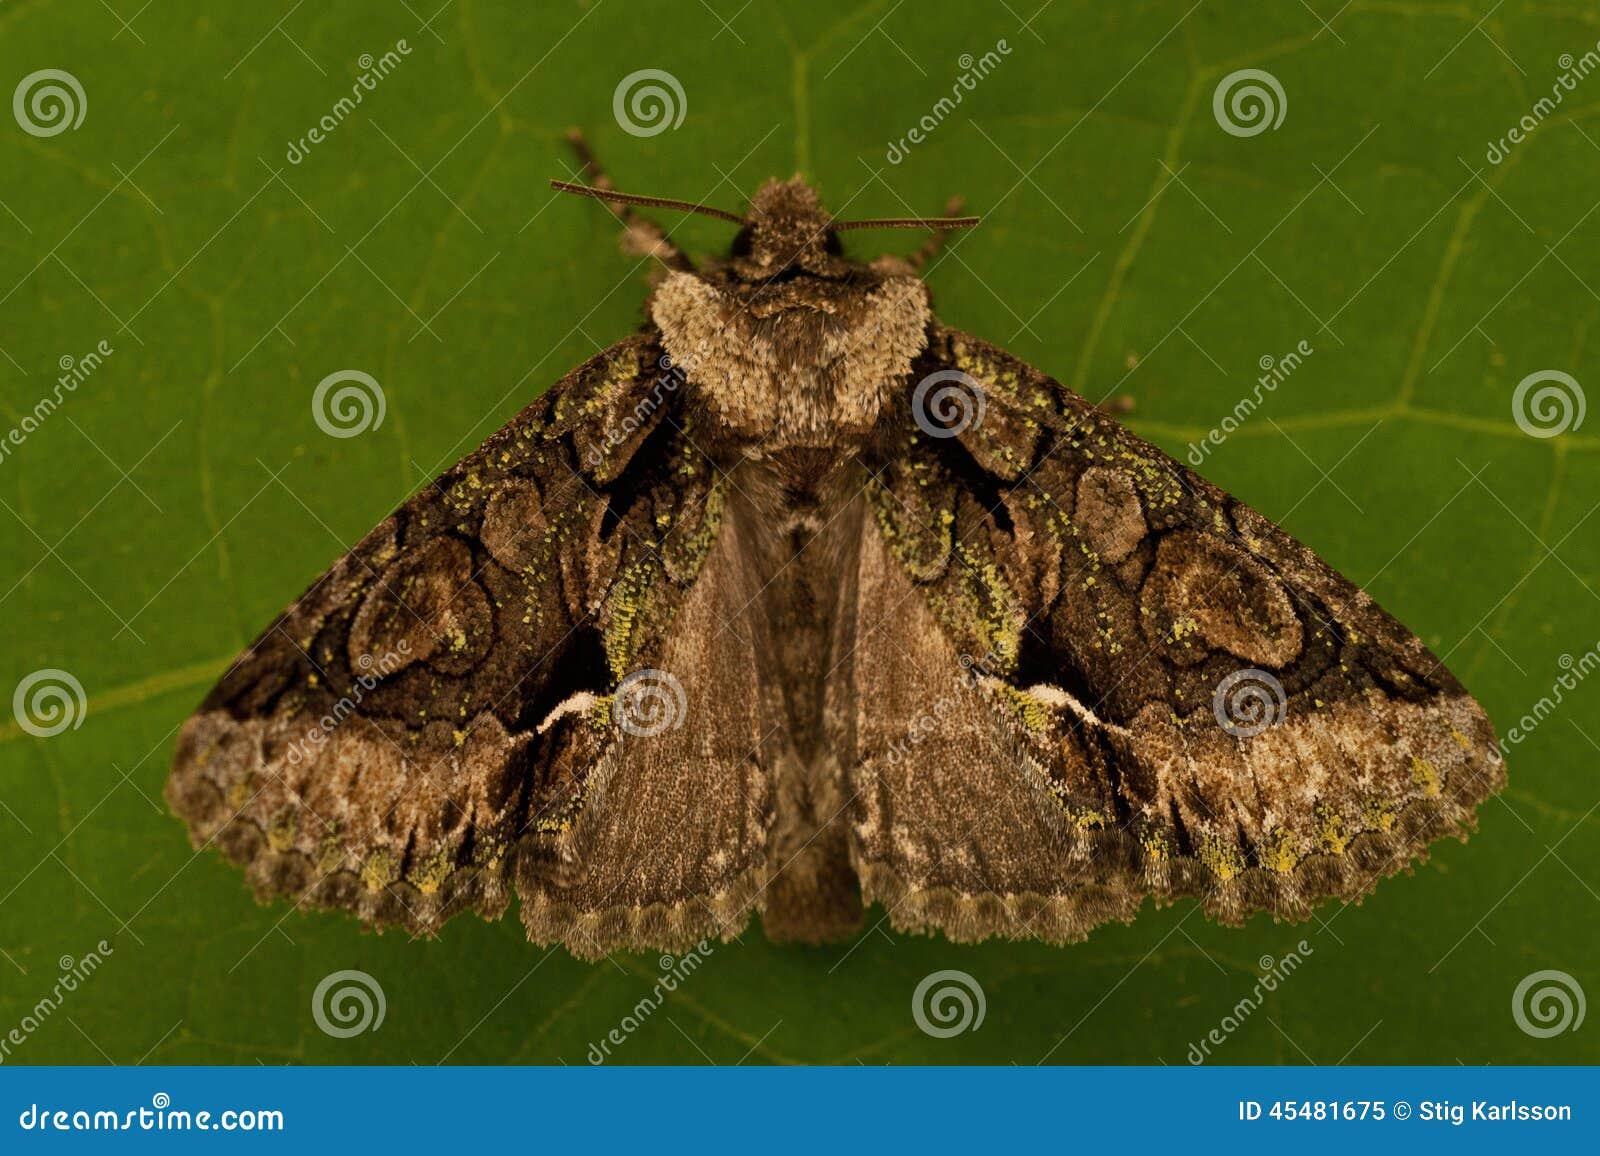 绿色有斑月牙, Allophyes oxyacanthae